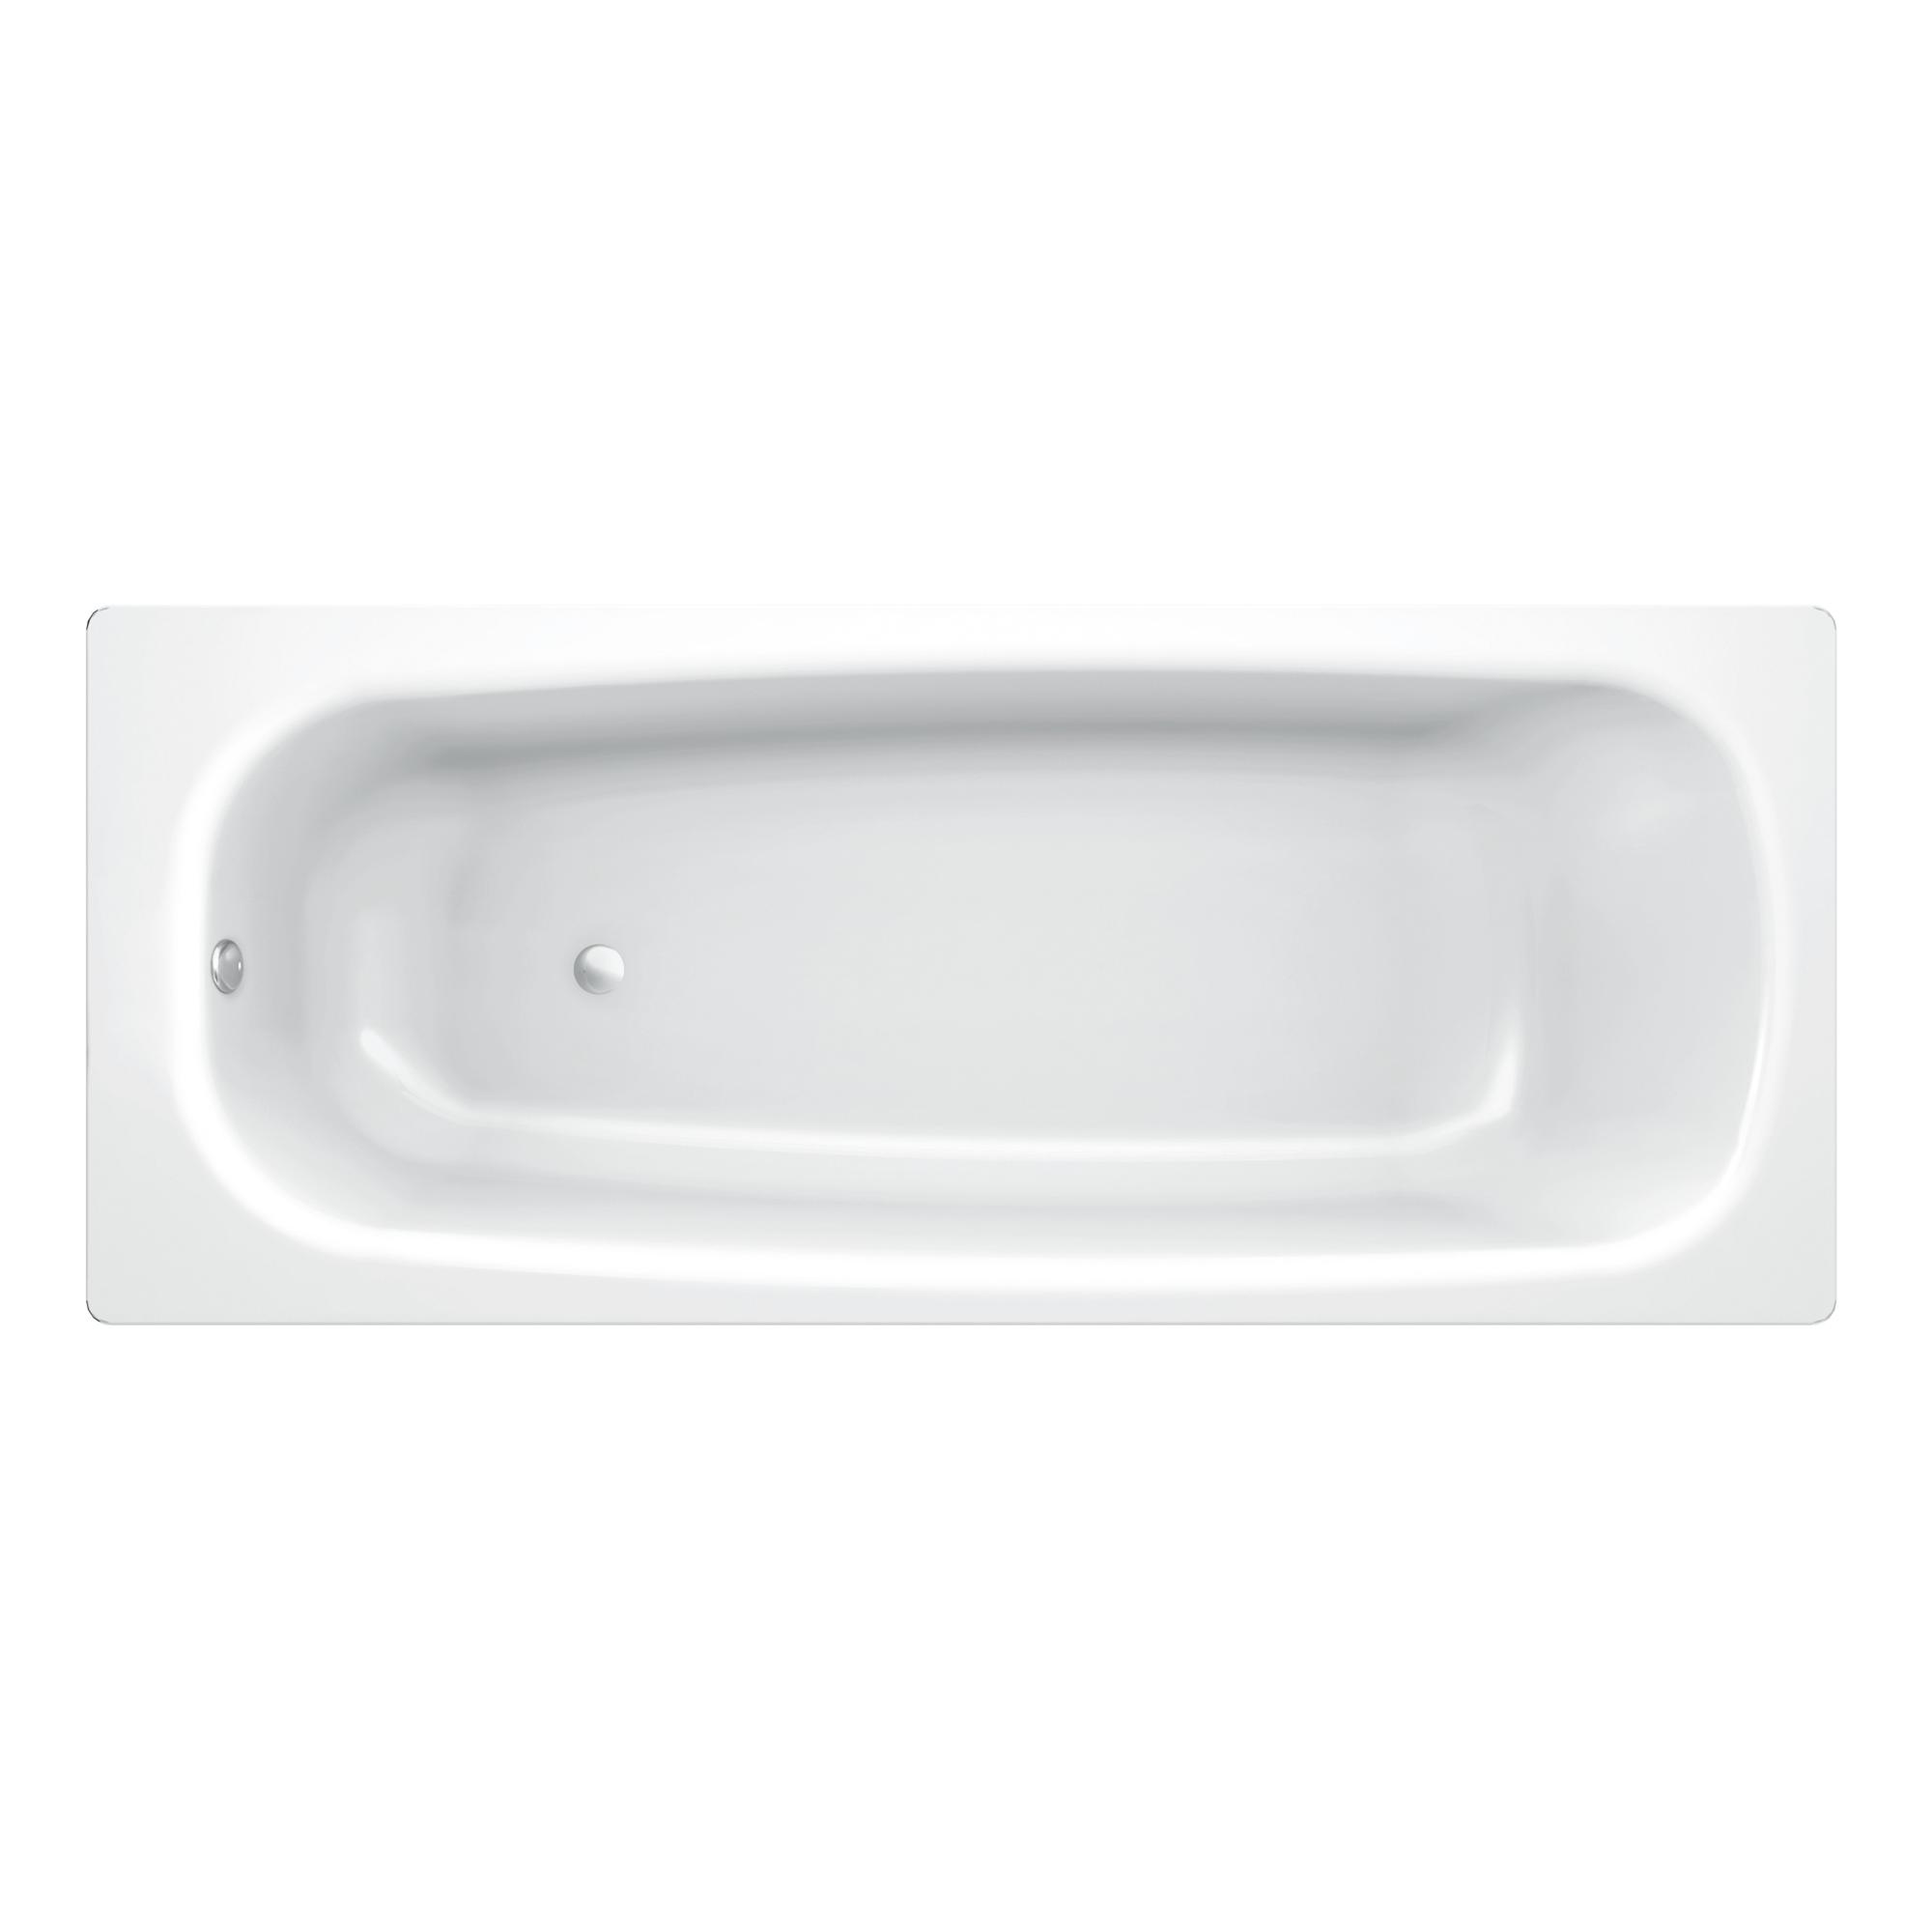 Стальная ванна Koller Pool Universal 170x75 с anti-slip с отв. под ручки robert walsh narrative of a journey from constantinople to england